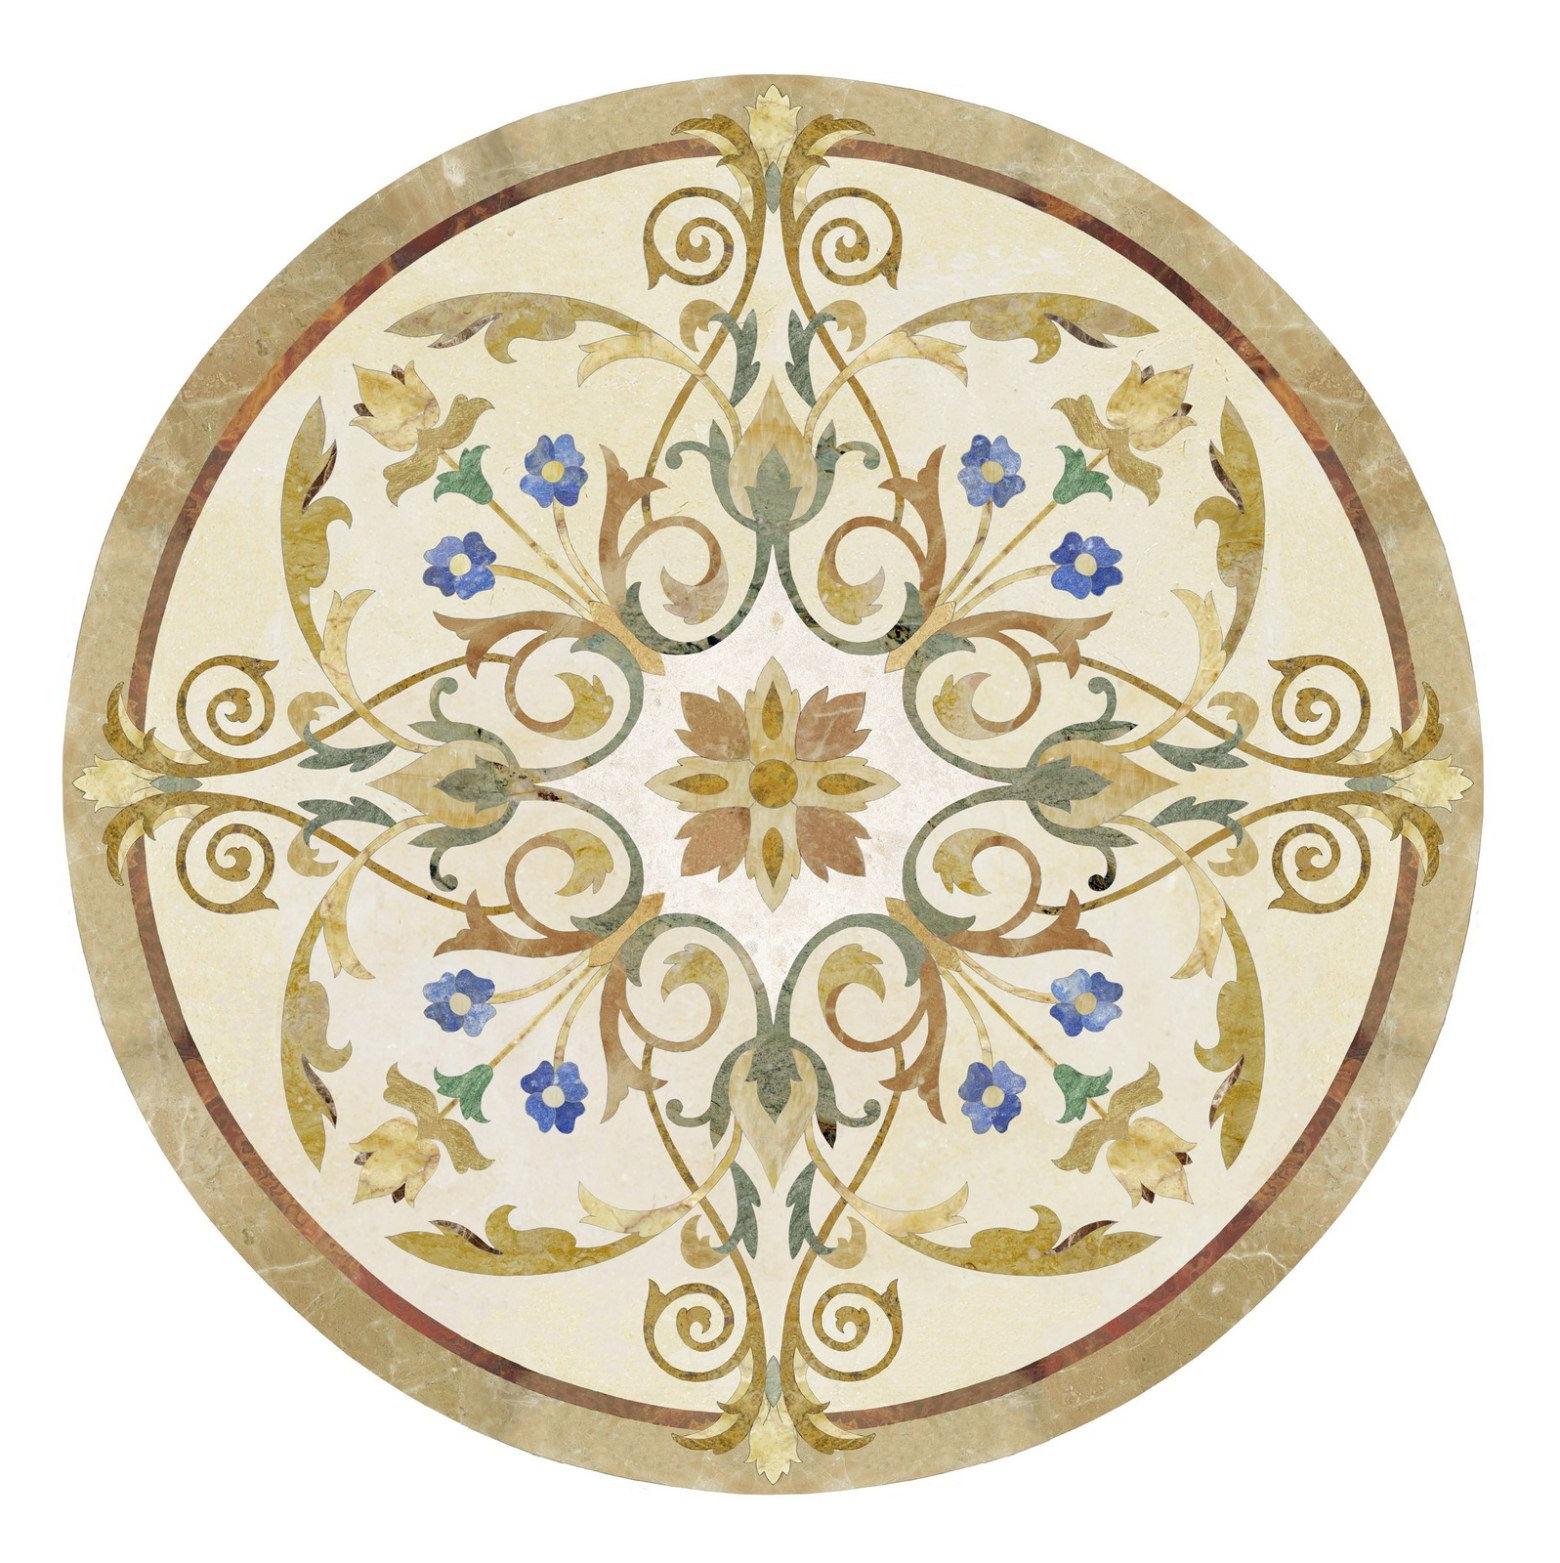 European Medallion Wall Décor Within Favorite European Medallion Collection – Creative Edge Master Shop (View 19 of 20)